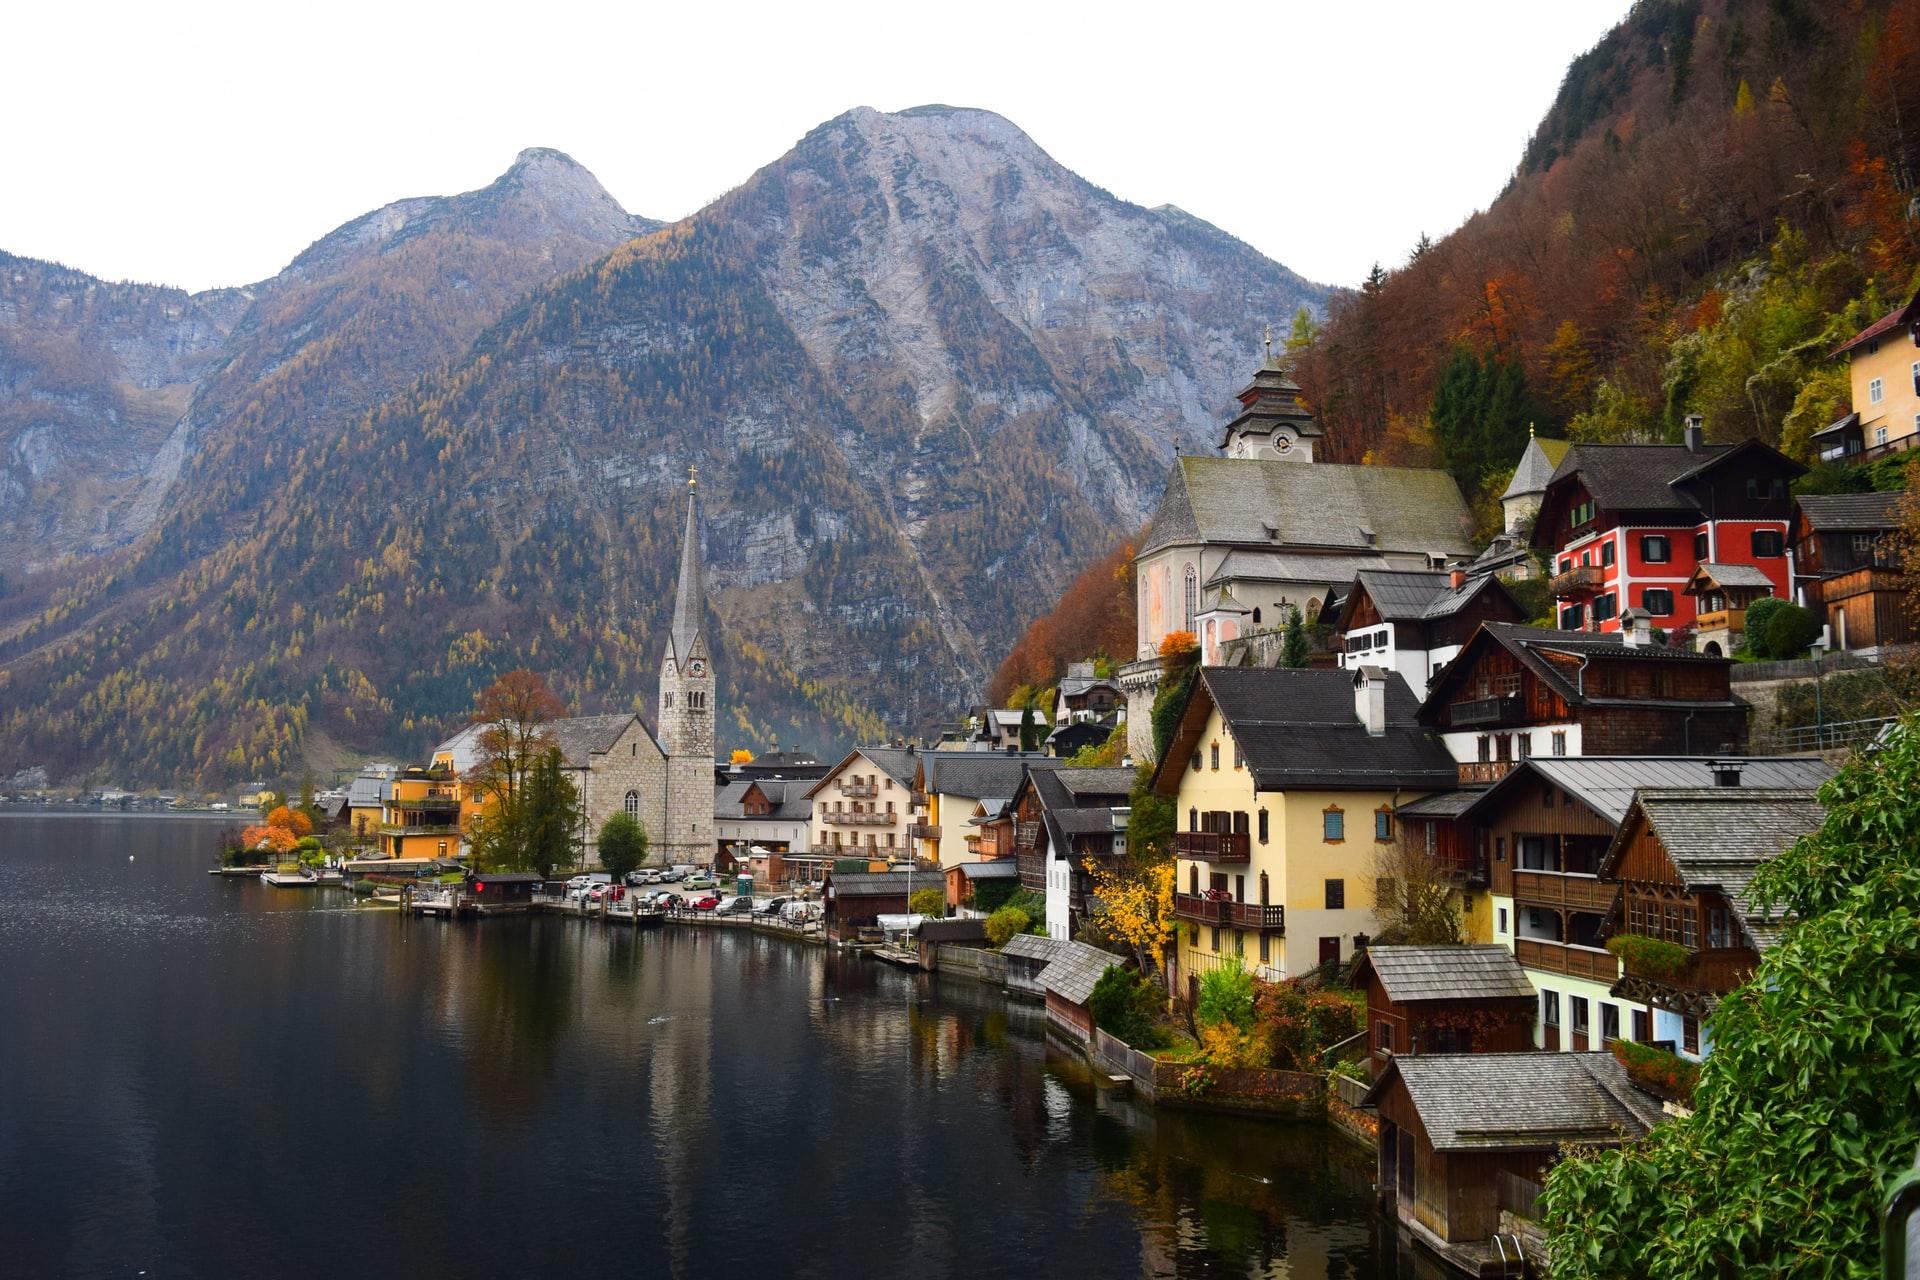 An idyllic Austrian village